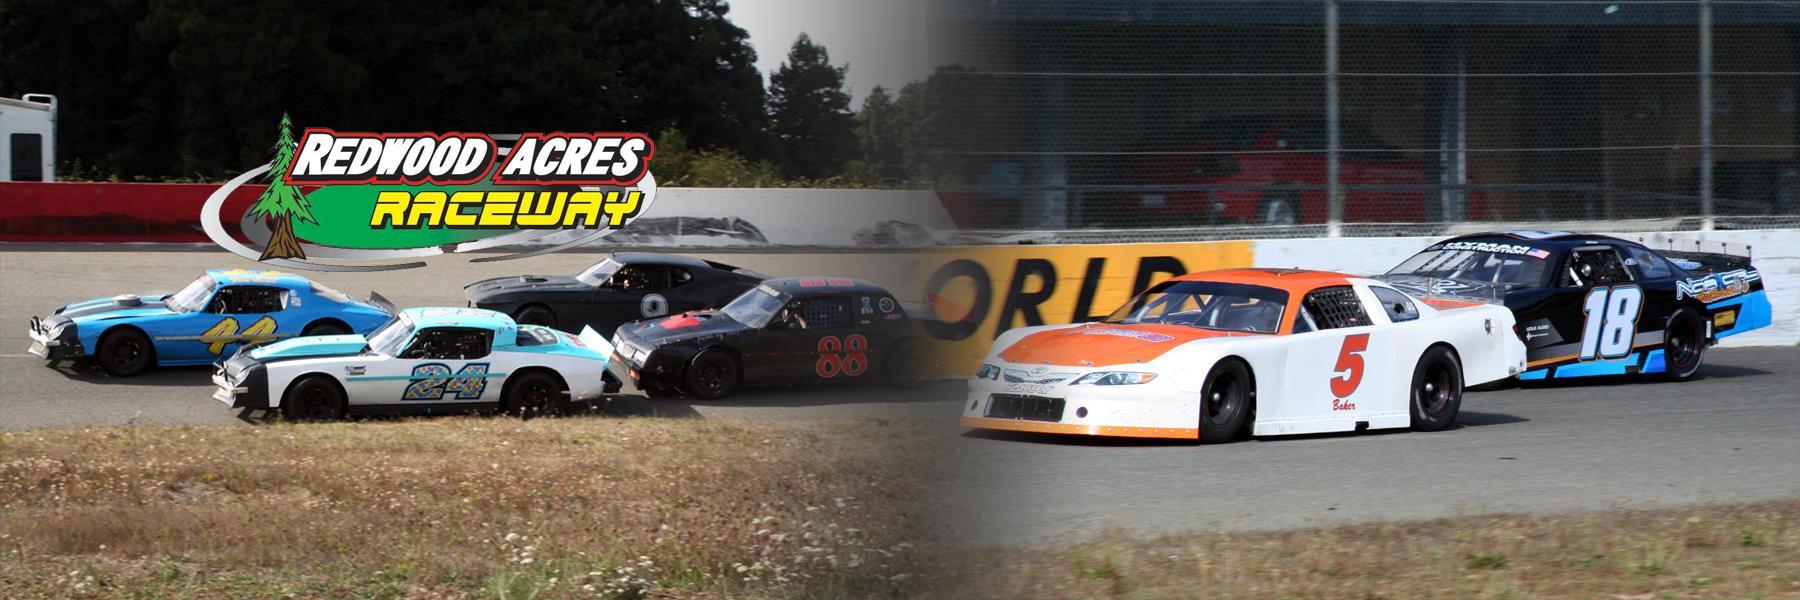 Redwood Acres Raceway